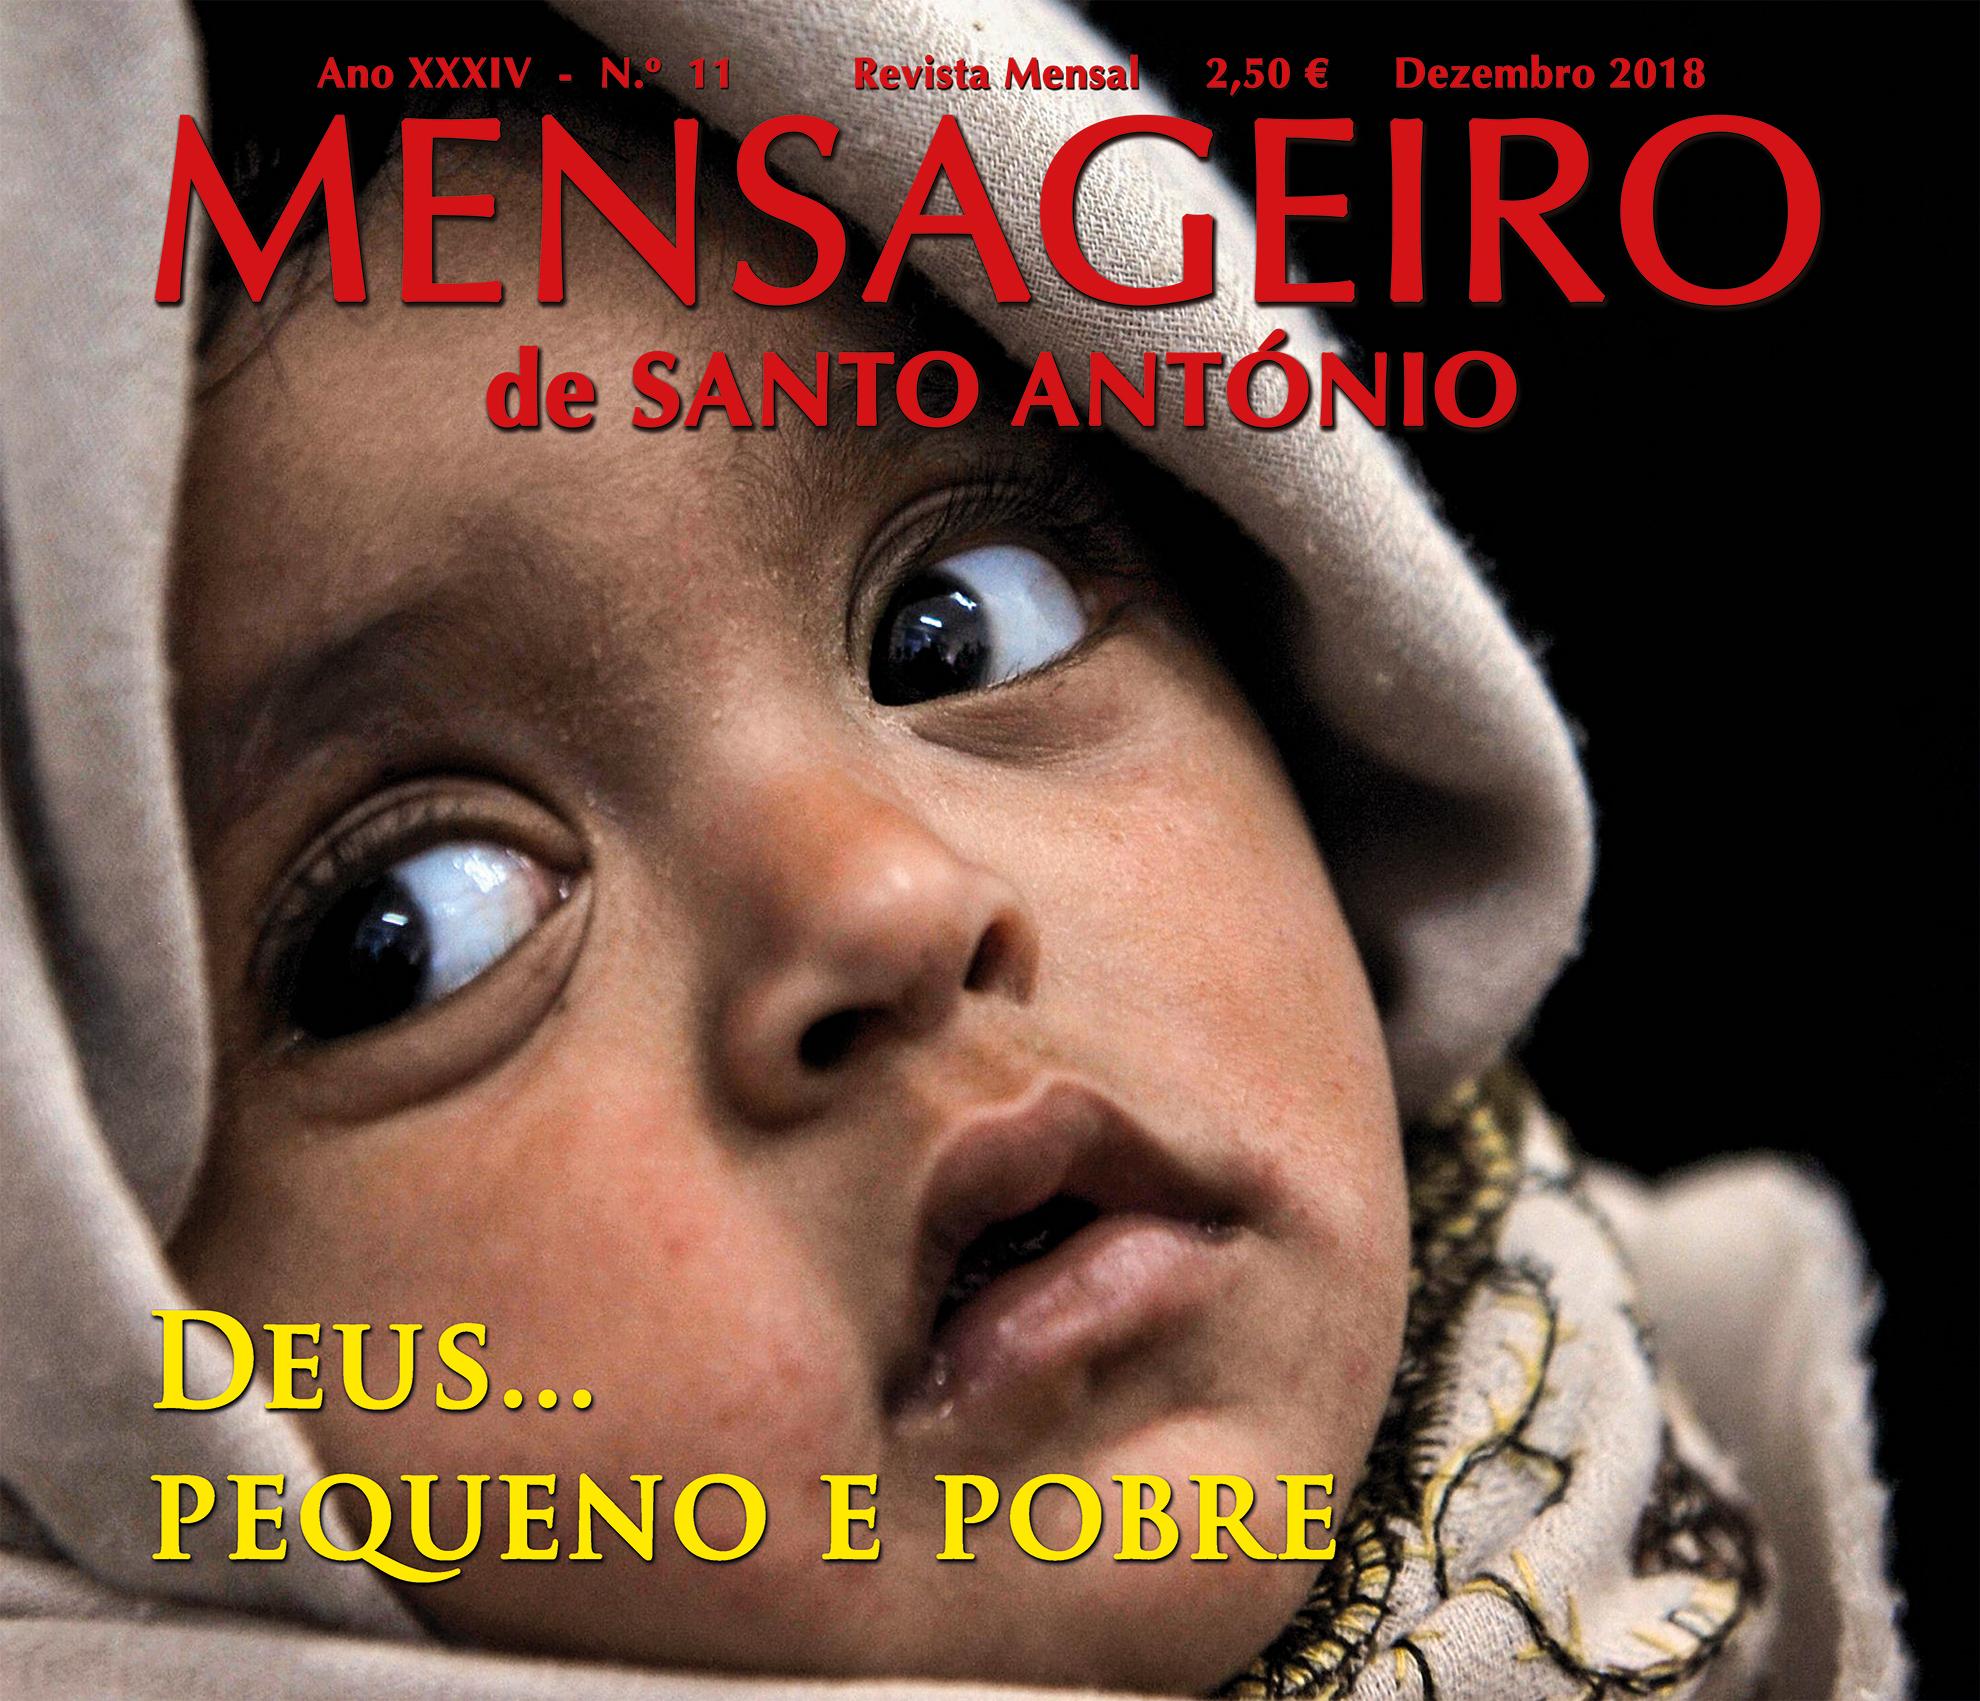 Mensageiro de Santo António dezembro 2018 aperitivo: Deus pequeno e pobre.